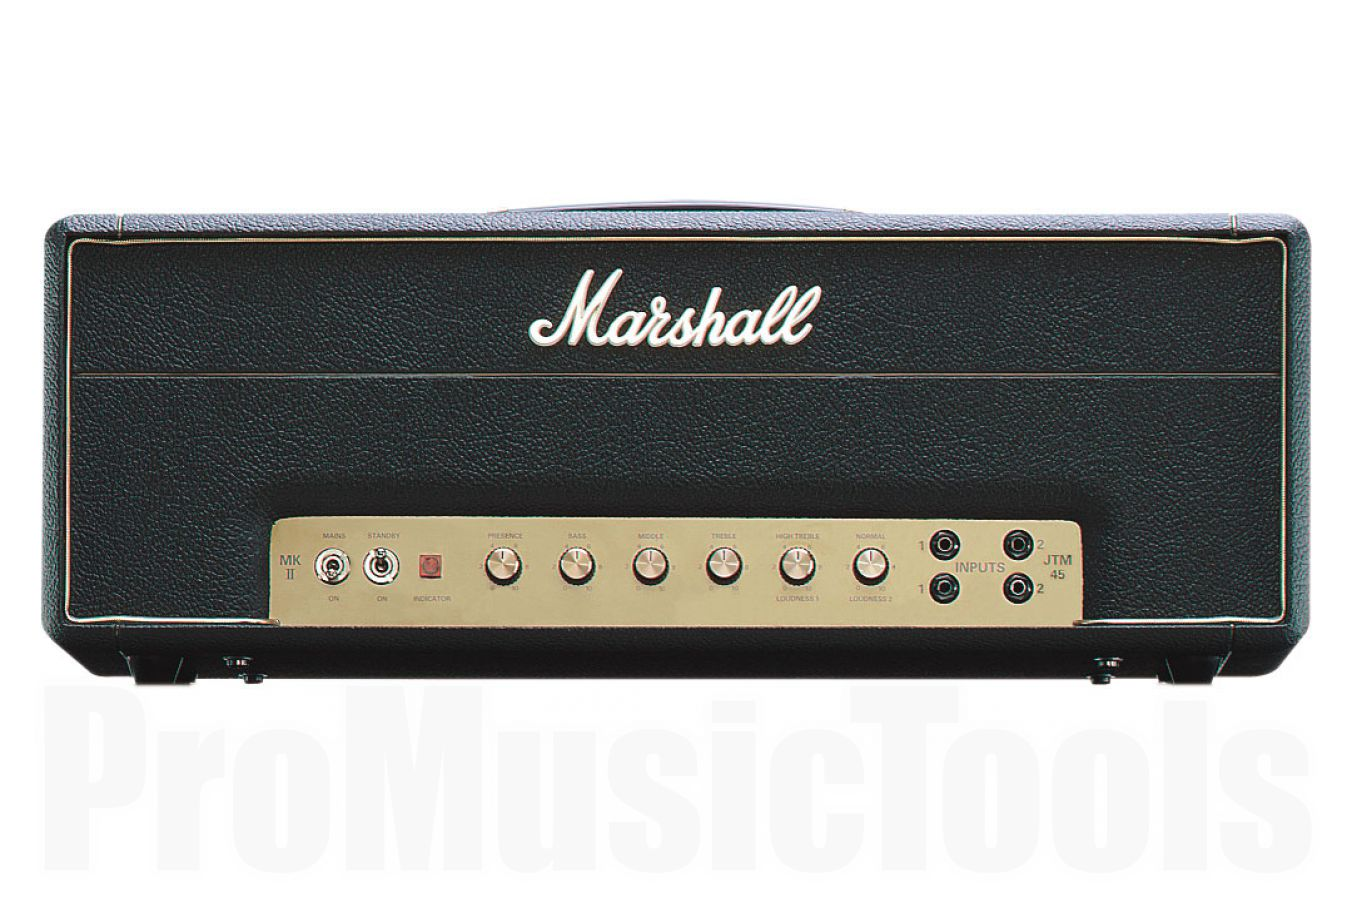 Marshall JTM45 2245 Vintage Re-Issue Series - b-stock (1x opened box)